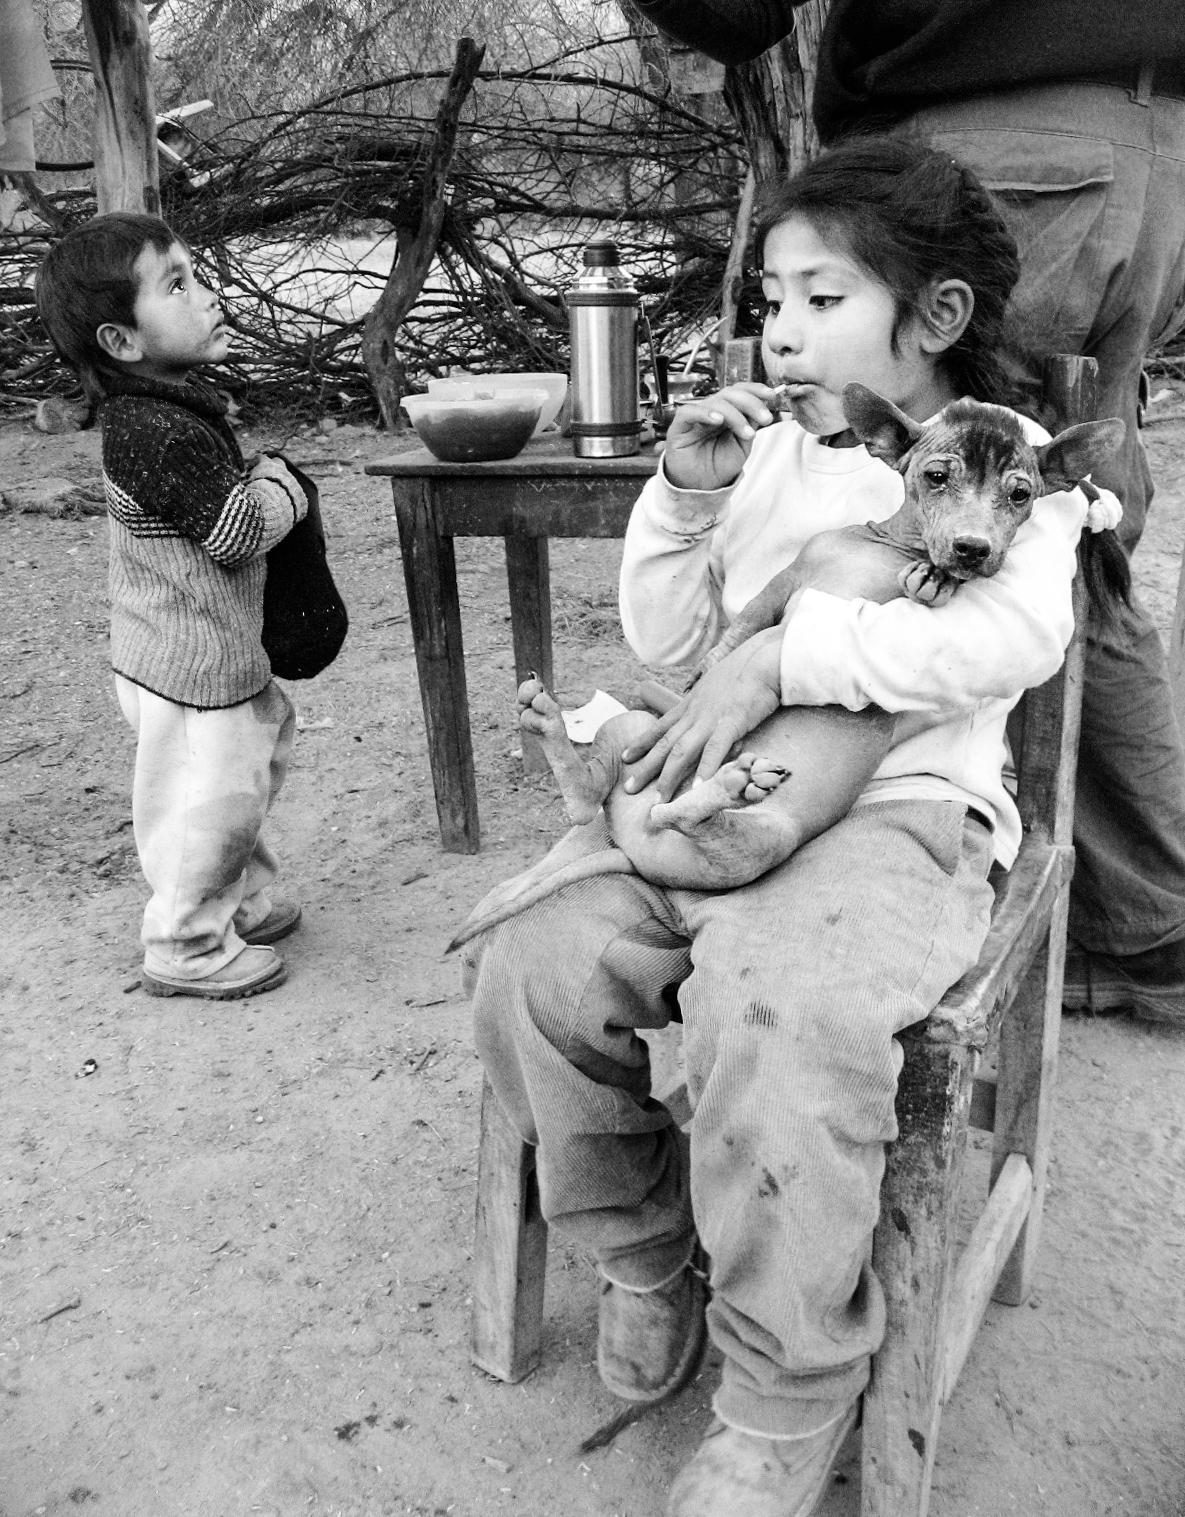 amaichi_museum-apachamama_ruins-quilmes-0802_children-girl-holding-dog-sucking-lolly.jpg